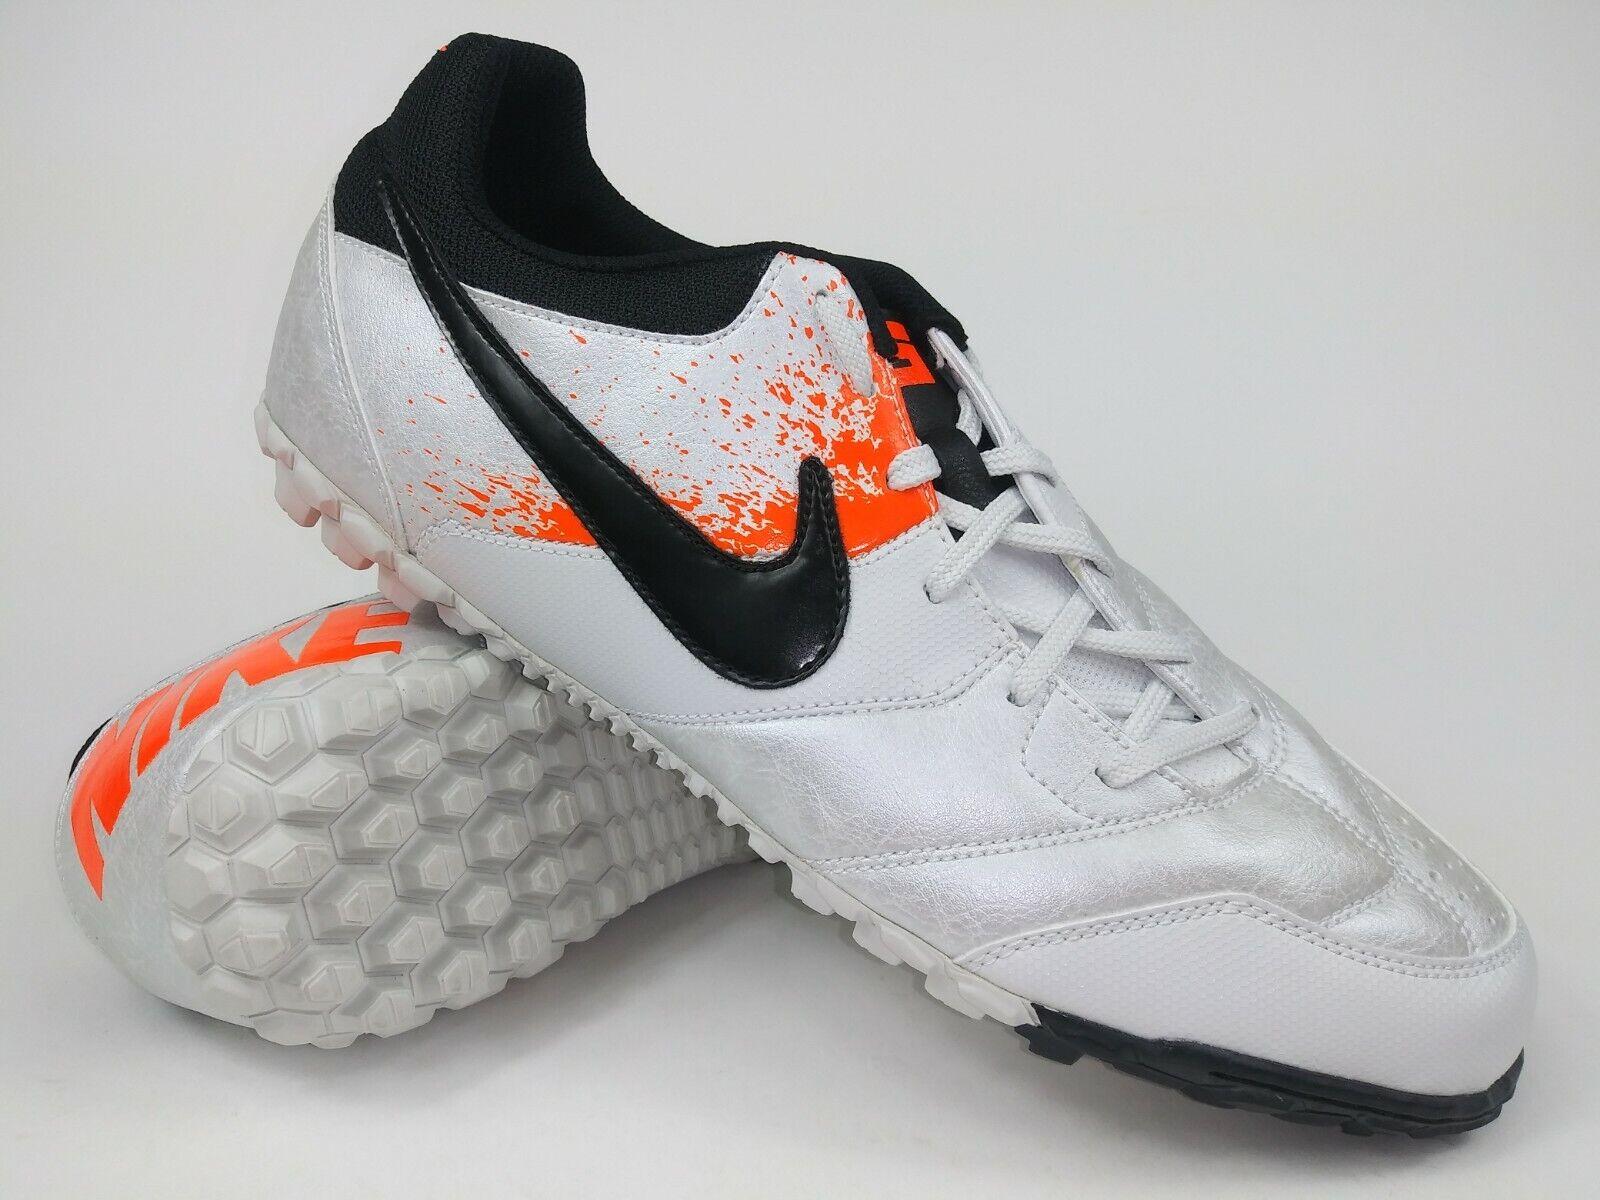 Nike Hombre Raro césped Nike 5 bomba 415130-108 blancoo Naranja Fútbol Zapatos Talla 8.5